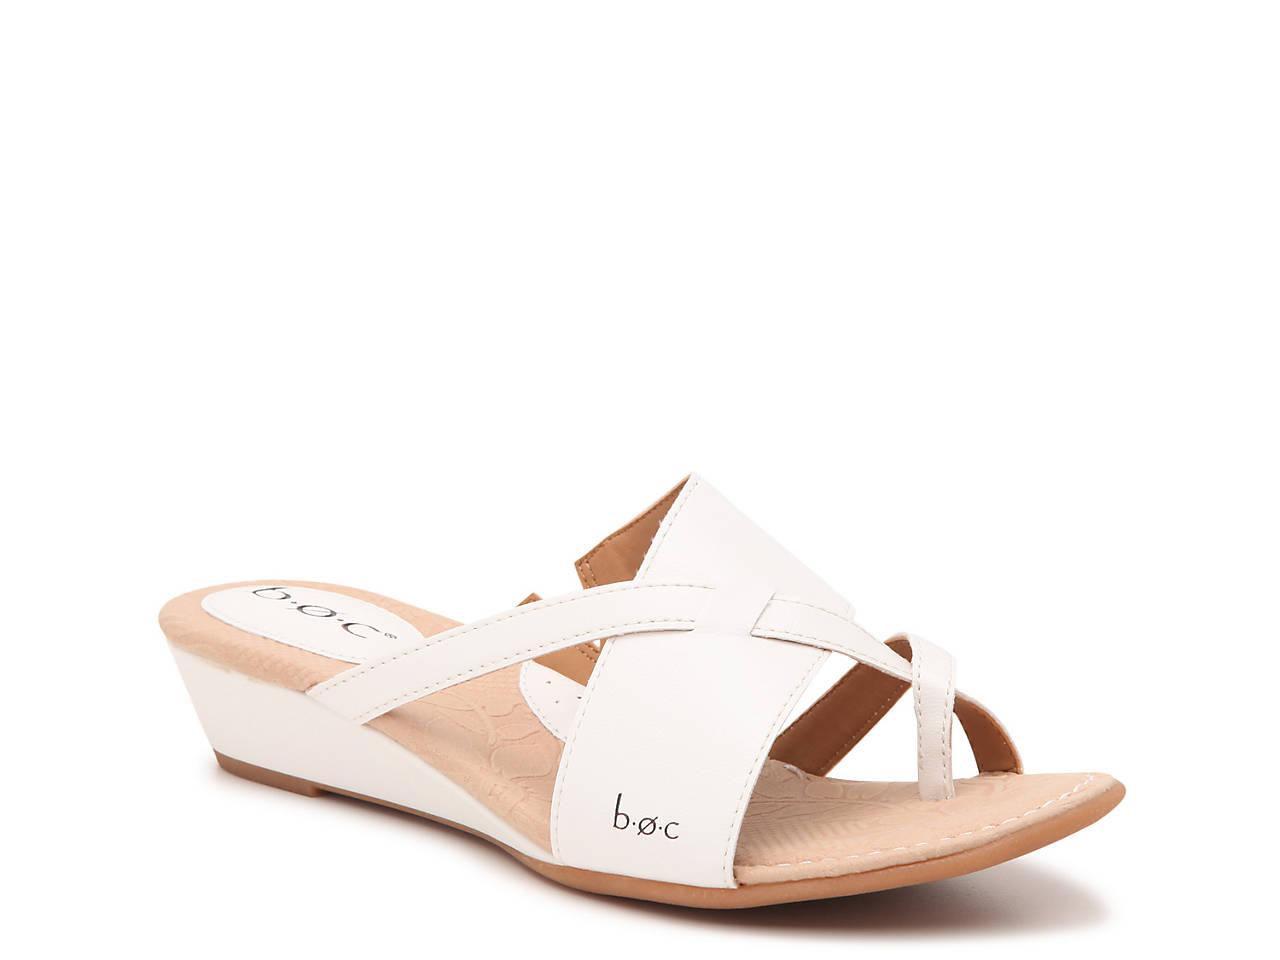 aafdc265ebcd b.o.c Ivins Wedge Sandal Women s Shoes